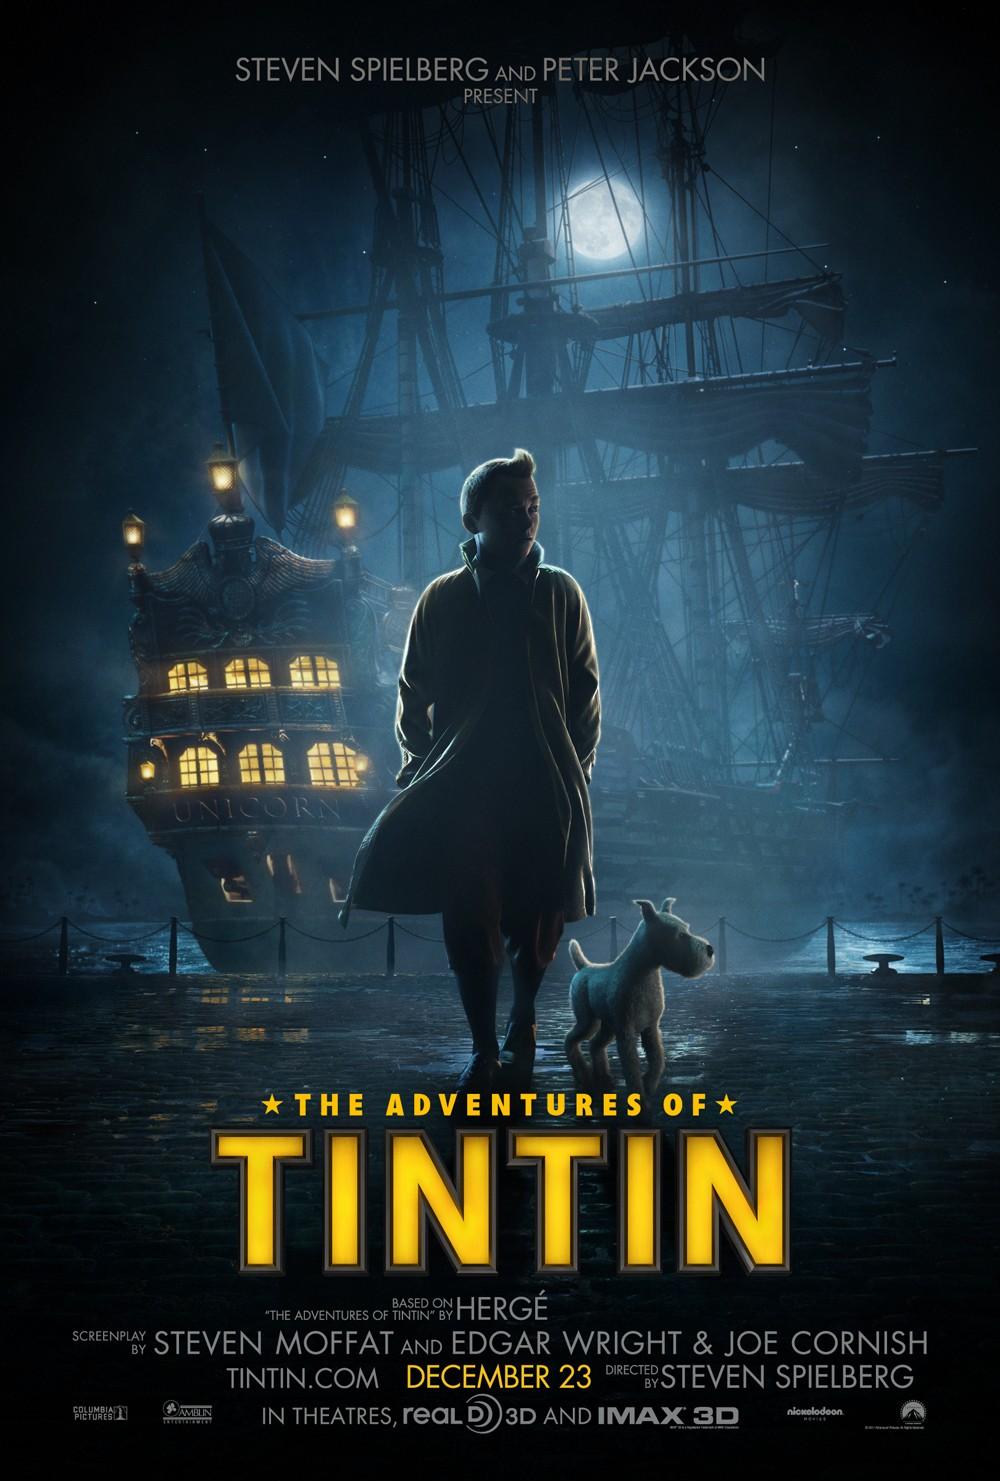 Tintin de Steven Spielberg (2011)